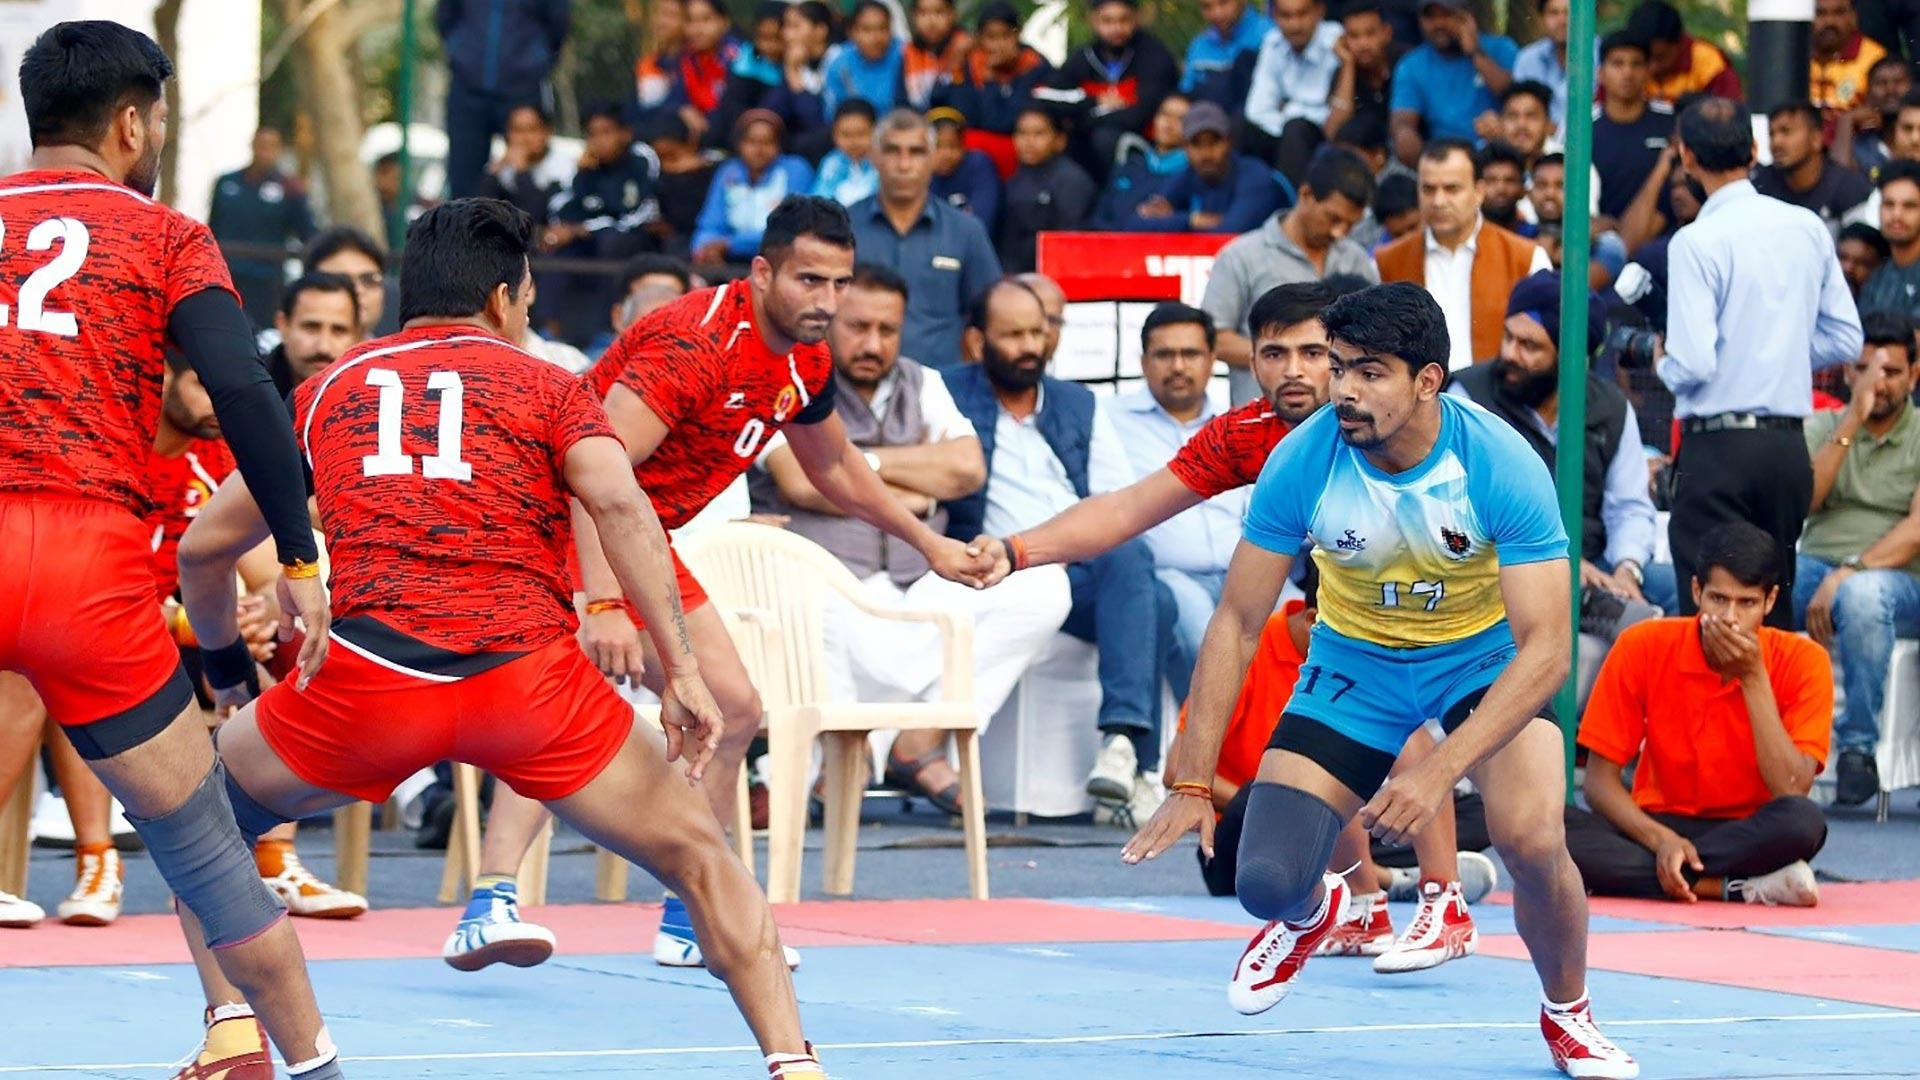 Haryana State Kabaddi Championships announced from 30th November 2021!